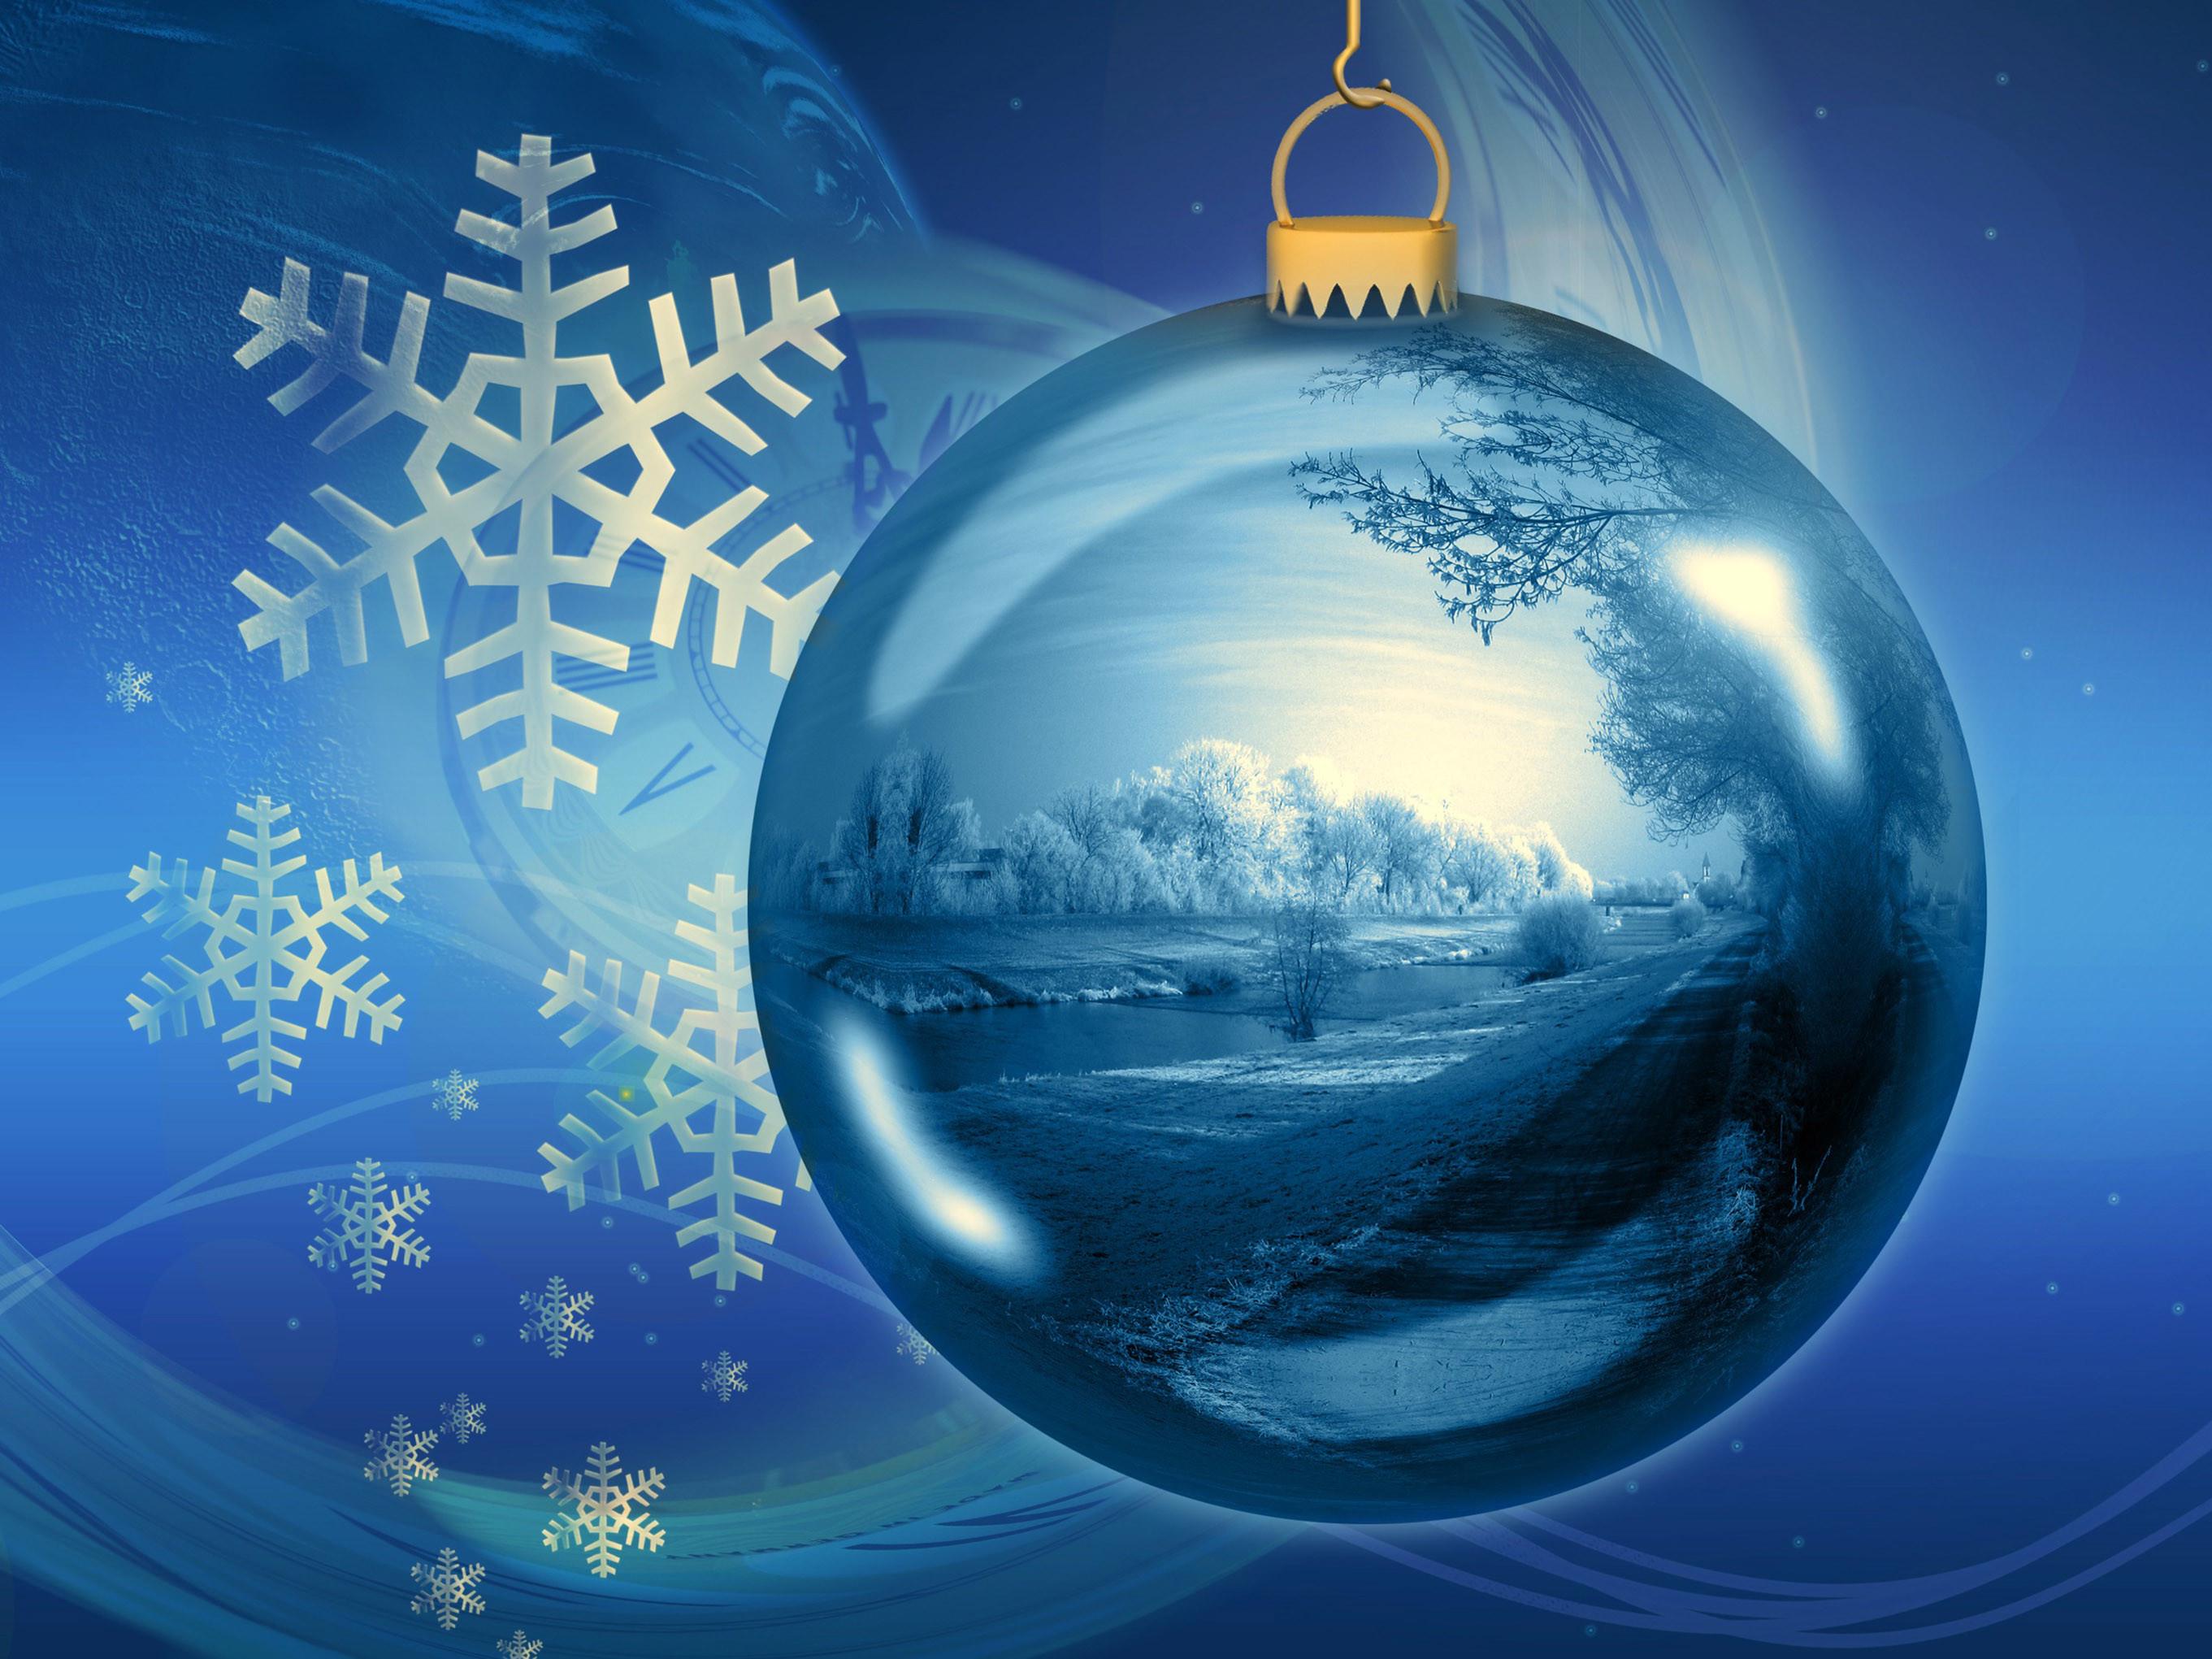 Christmas Snow Globe Wallpaper (63+ Images